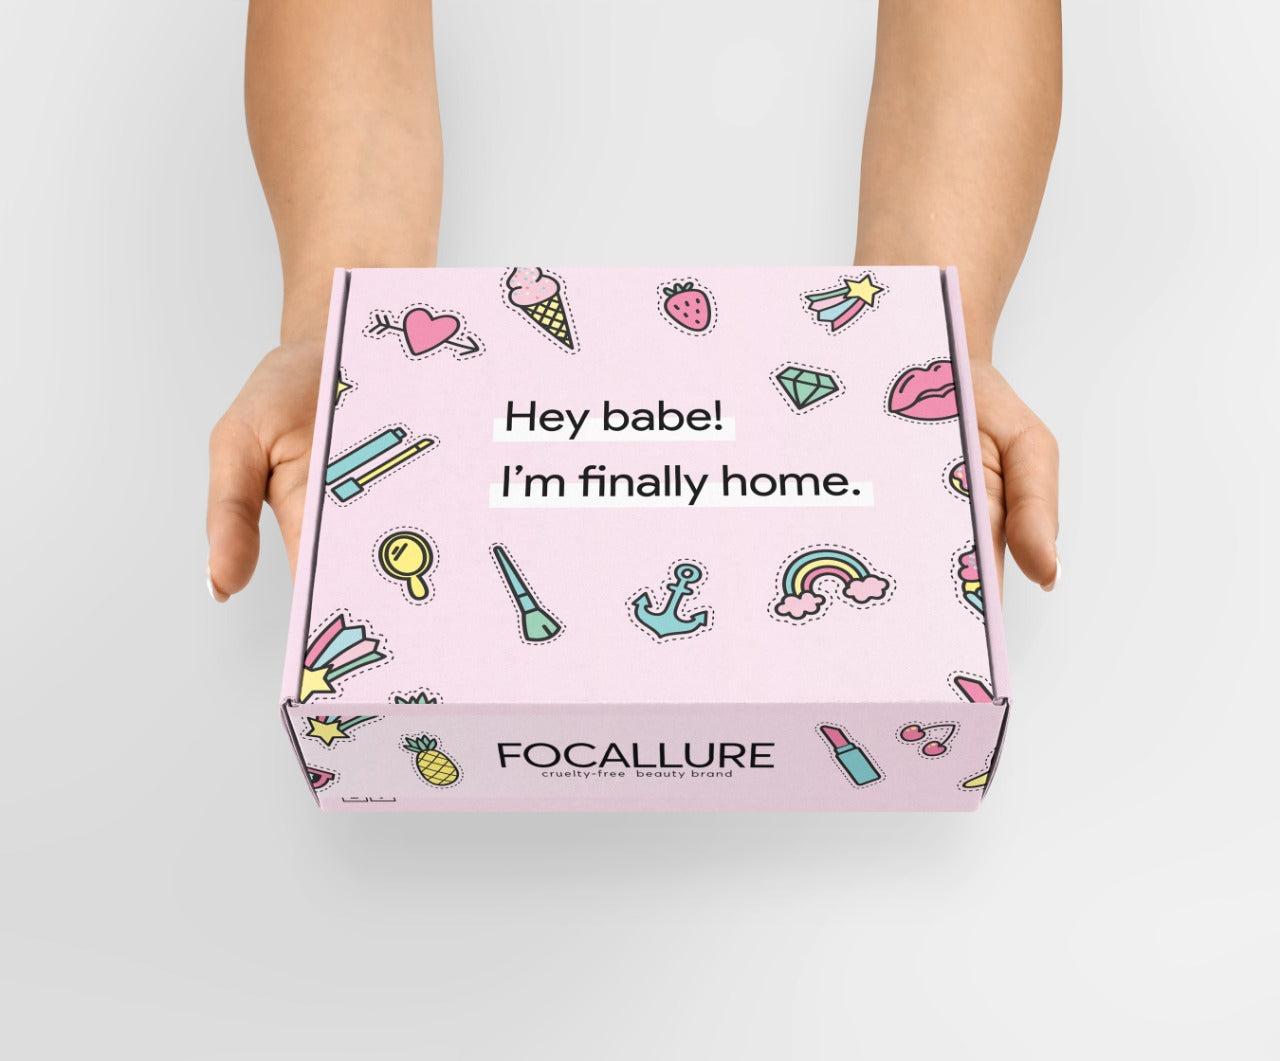 shopfocallure.com - Our All New Subscription Box